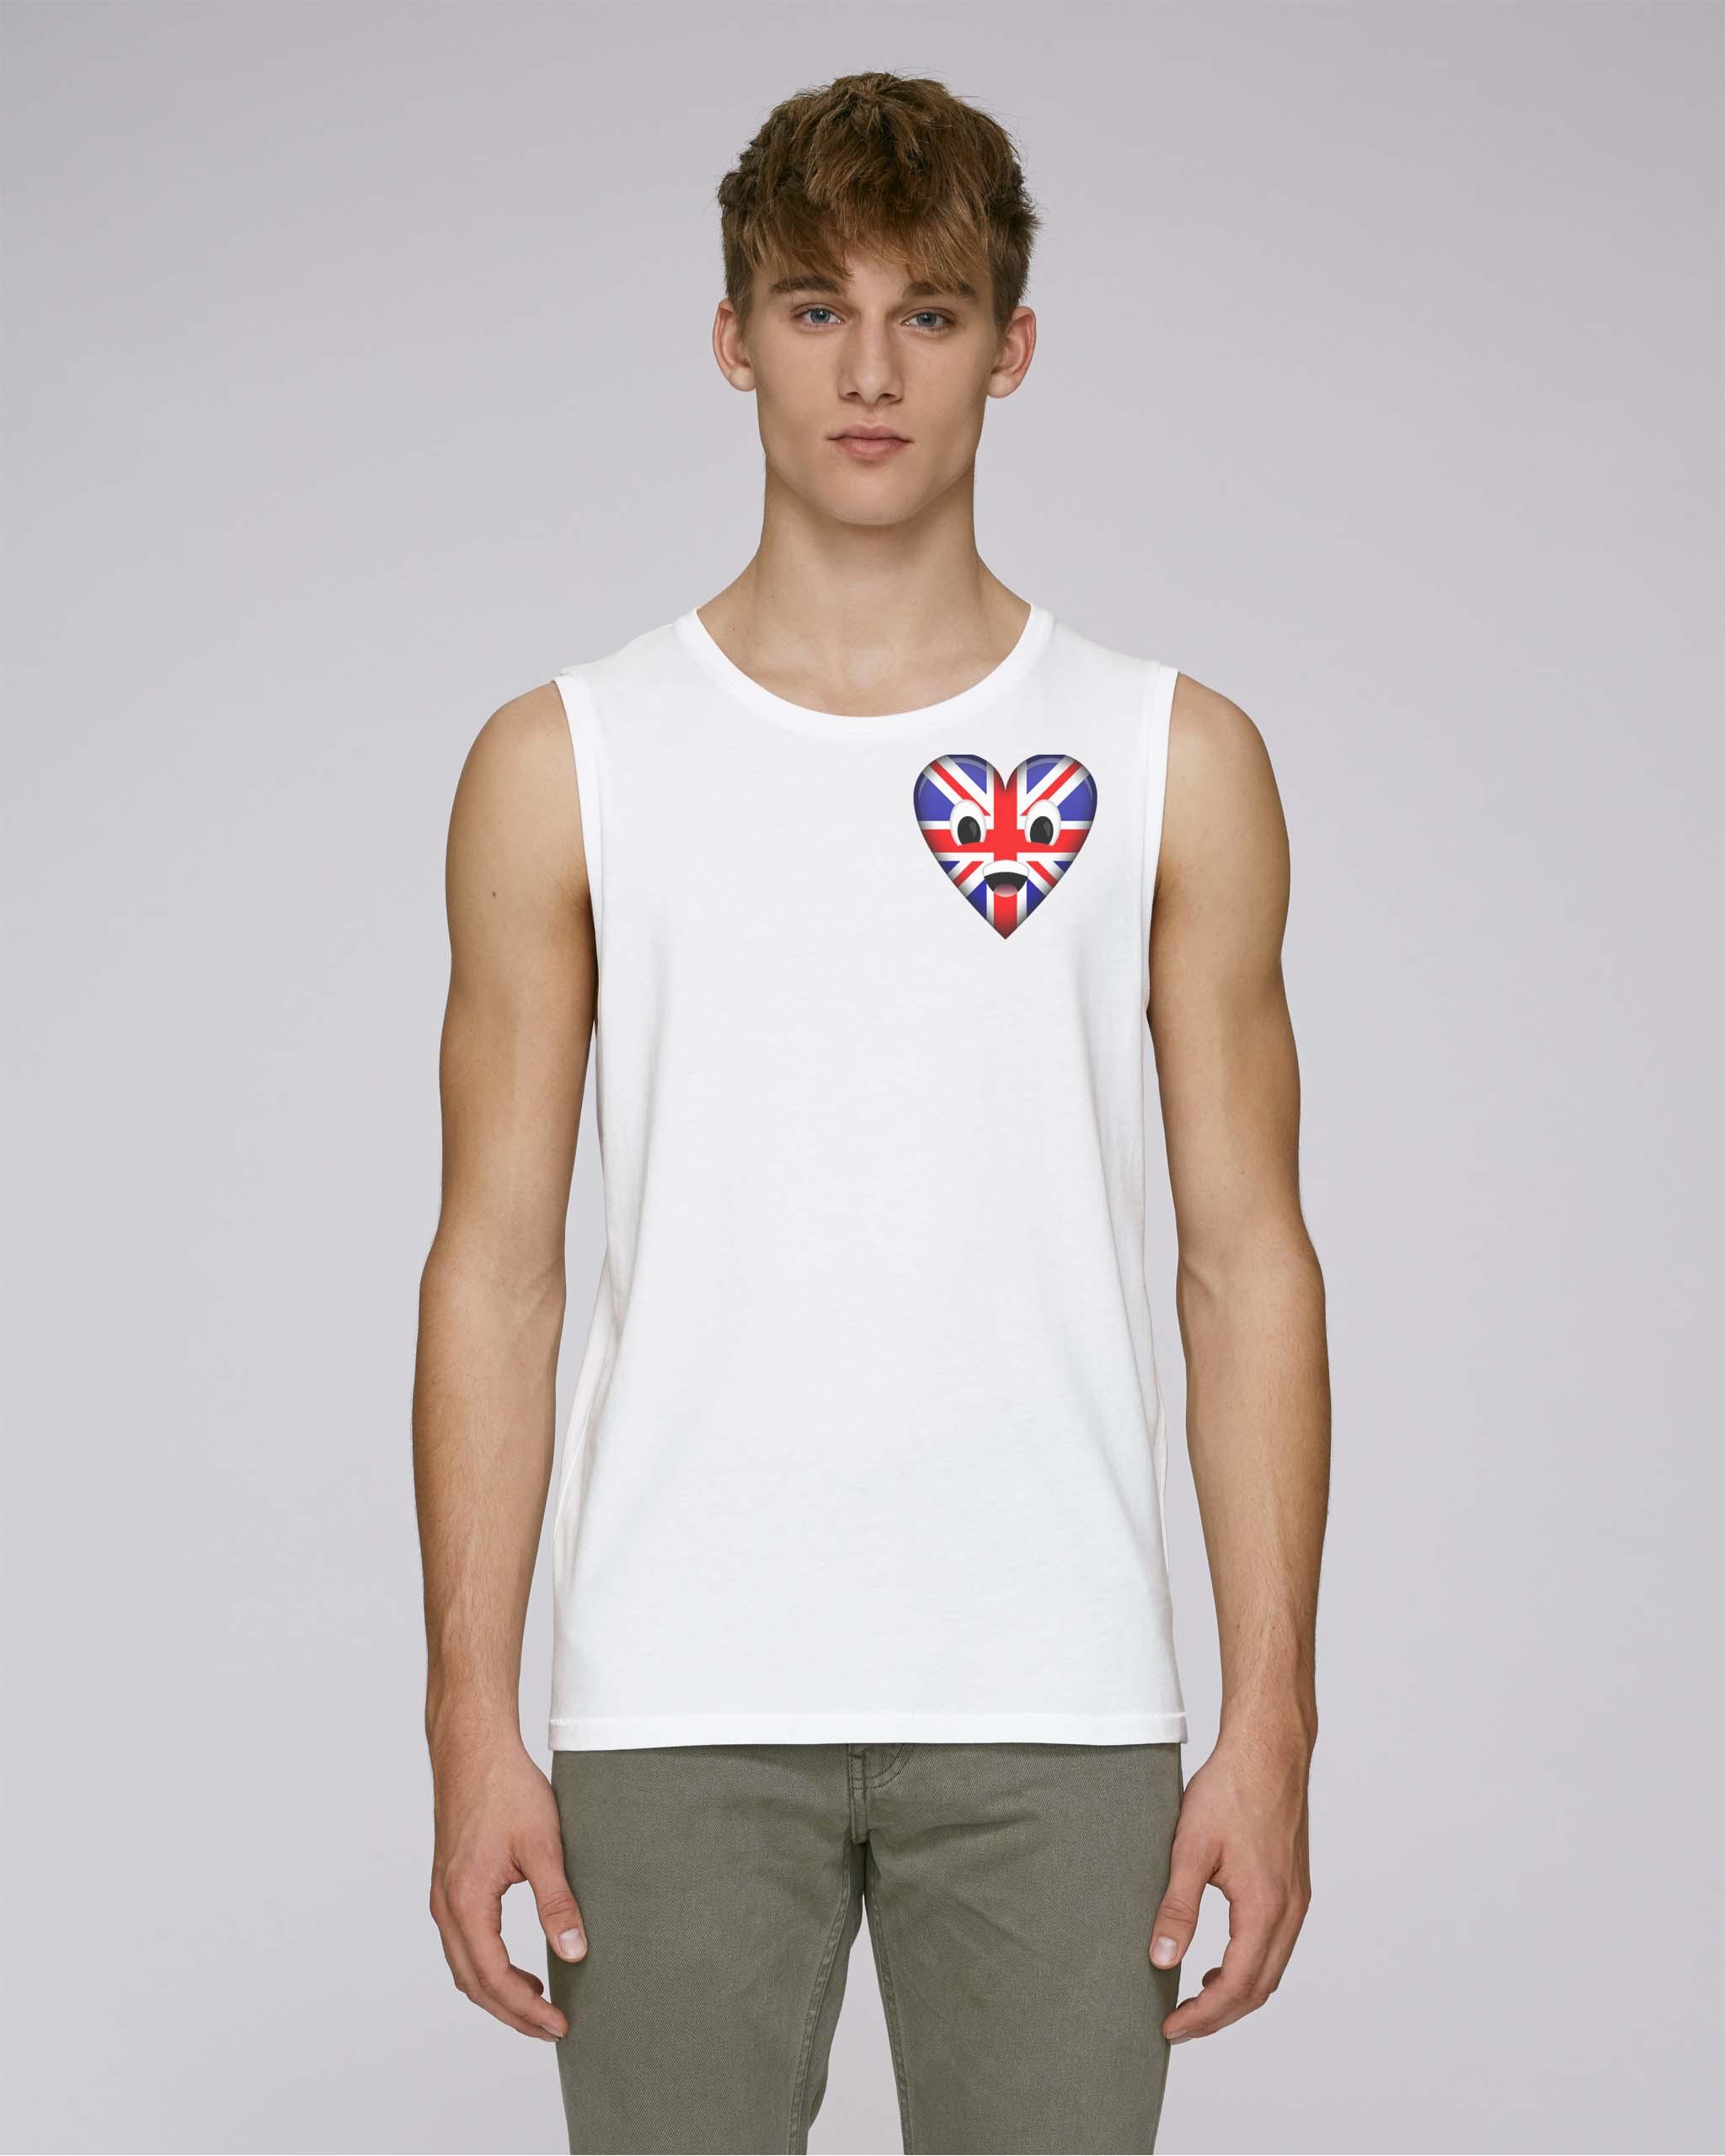 T-shirt bio blanc manche courte homme - uk tee